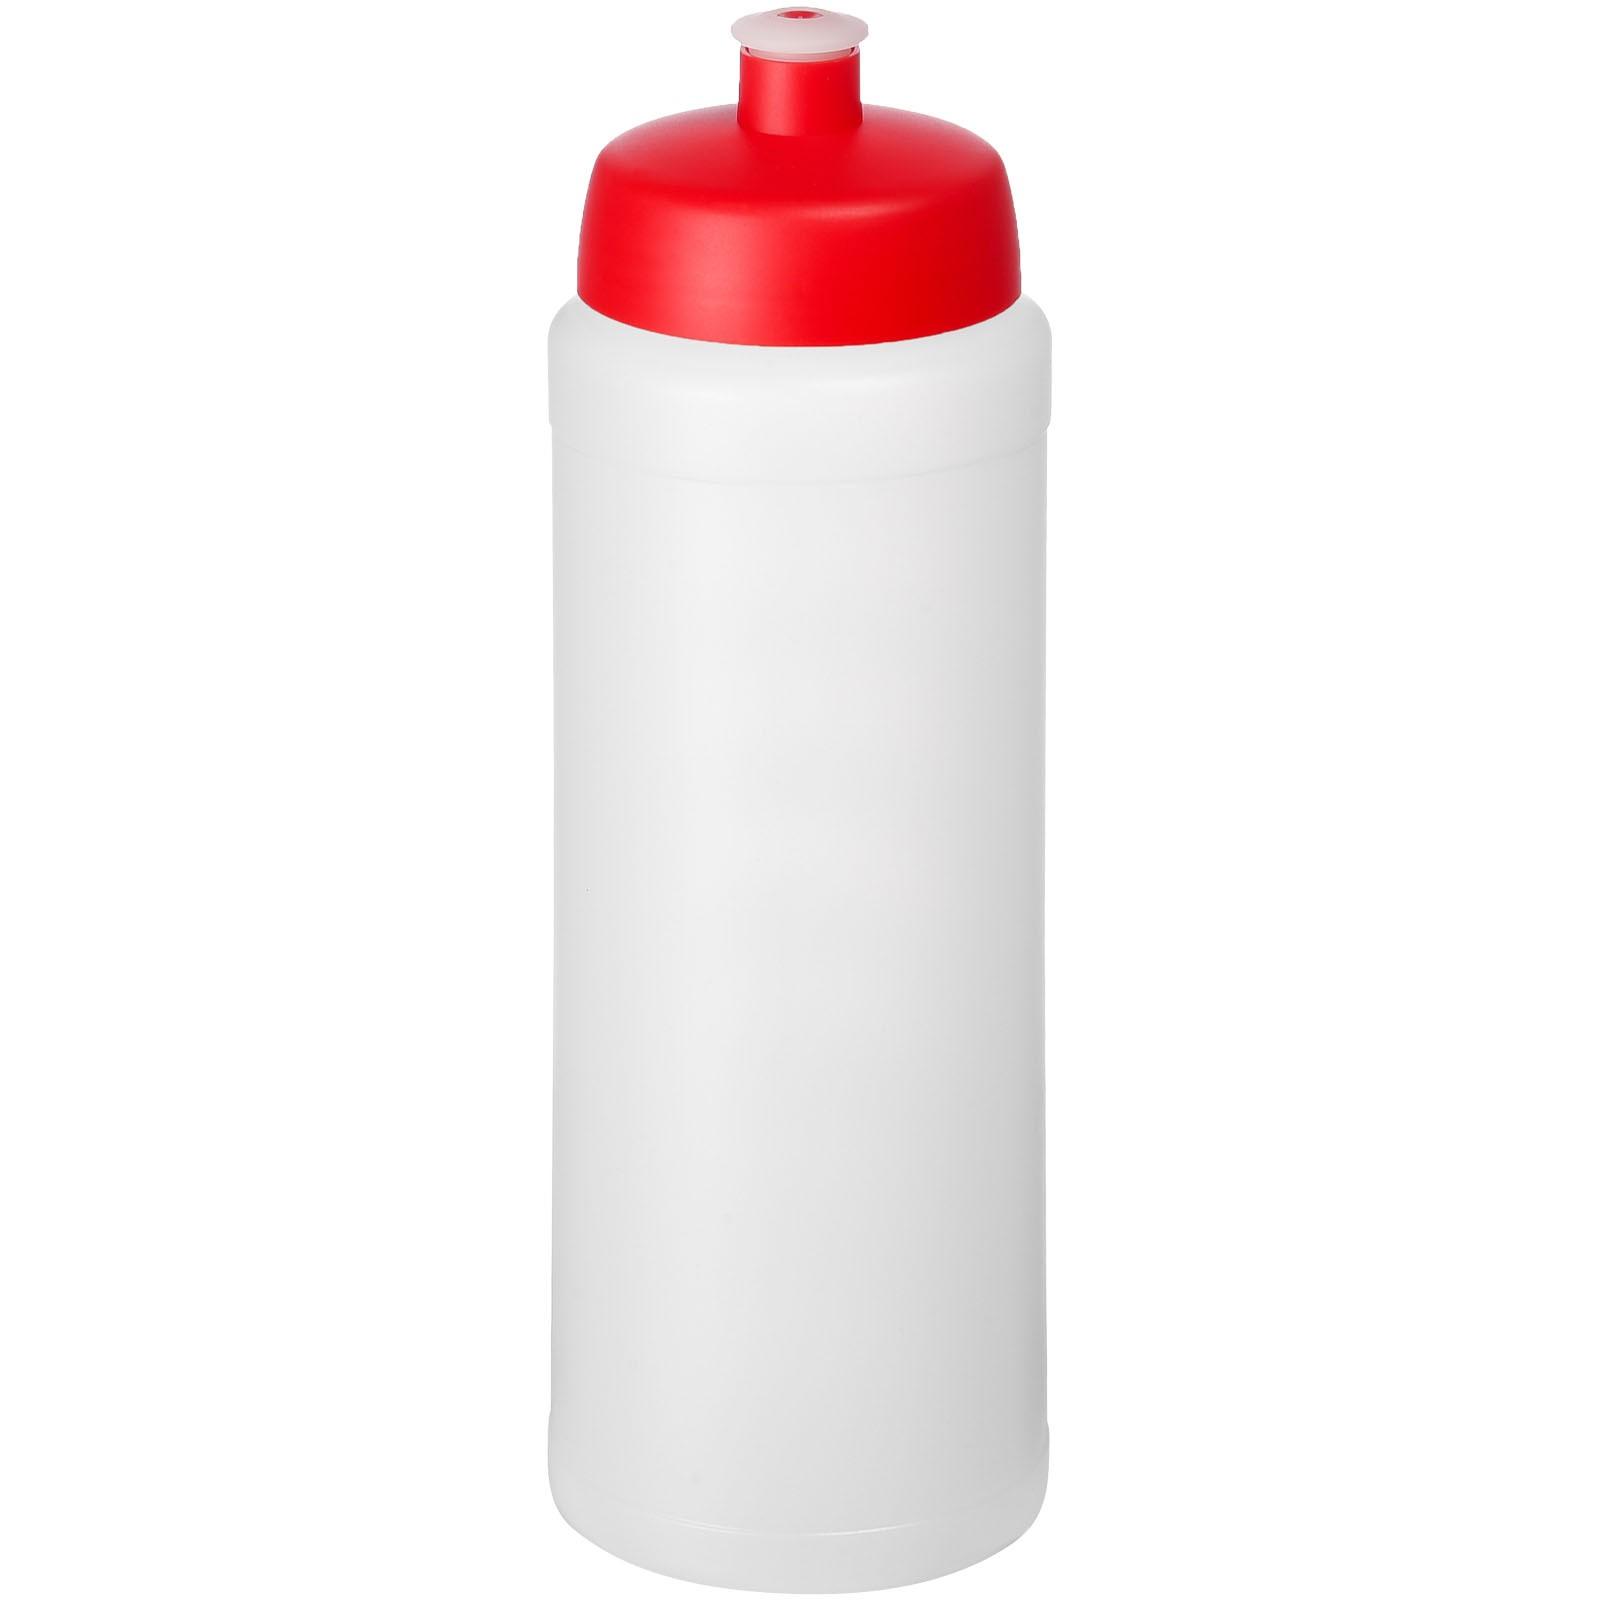 Baseline® Plus grip 750 ml sports lid sport bottle - Transparent / Red